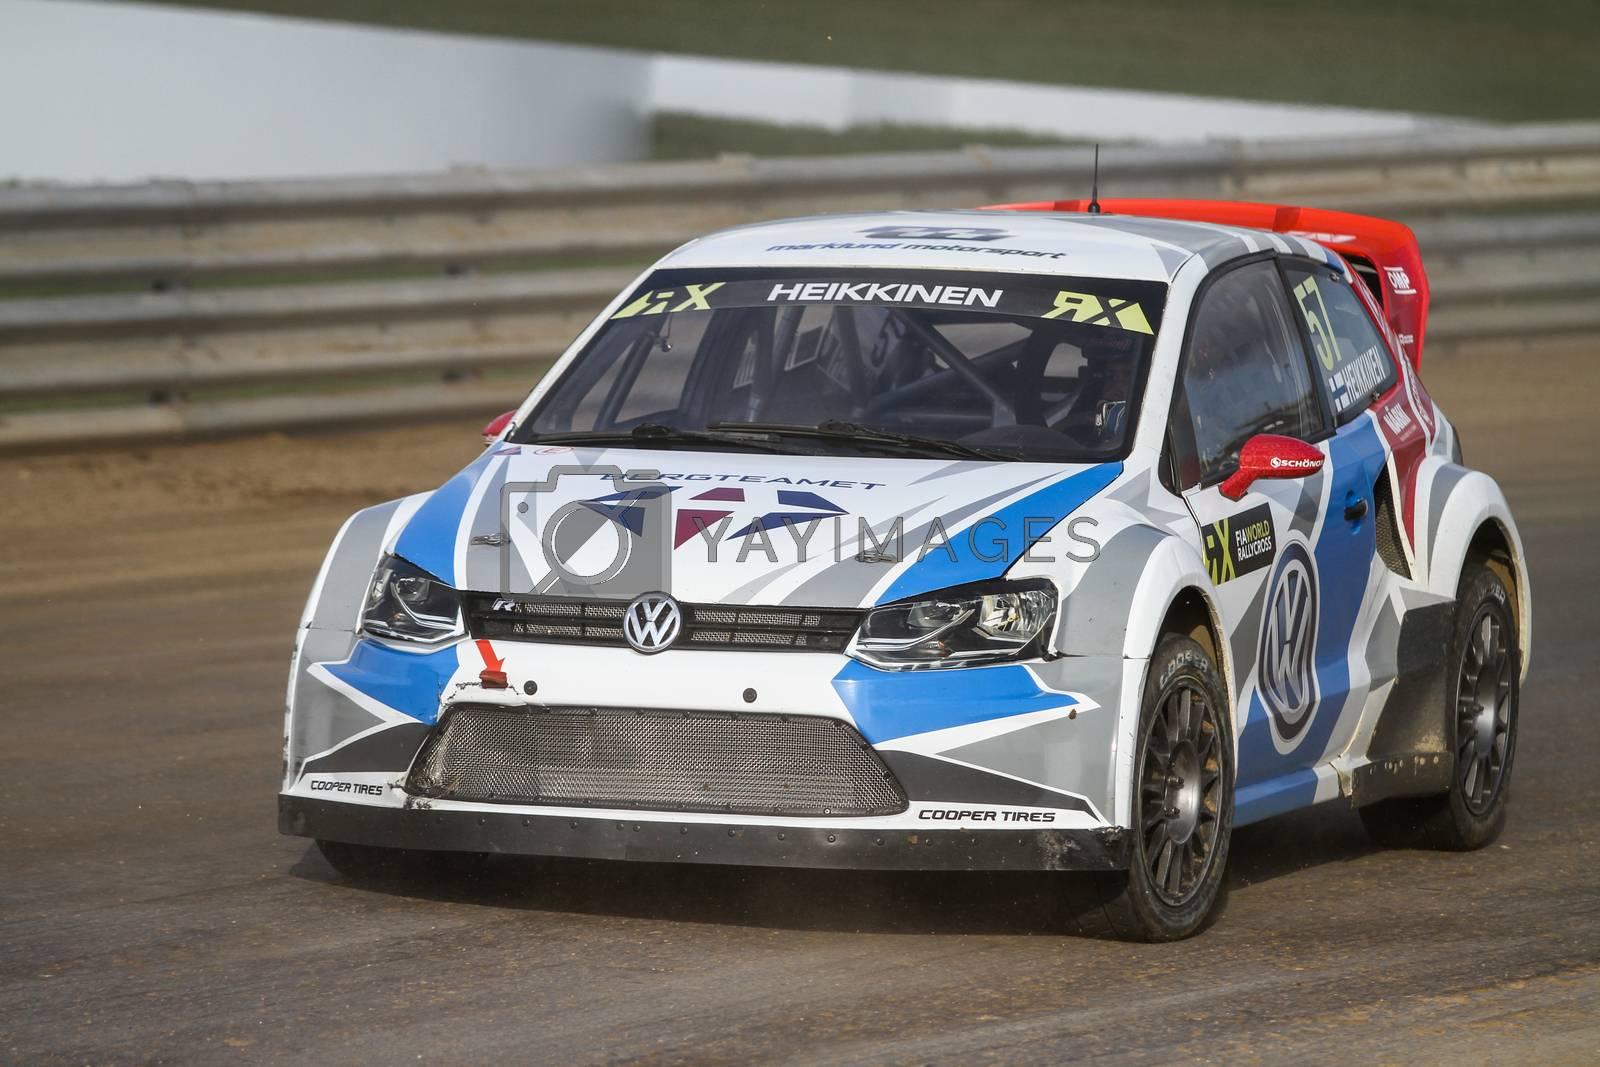 ISTANBUL, TURKEY - OCTOBER 03, 2015: Toomas Heikkinen drives Volkswagen Polo of Marklund Motorsport Team in FIA World Rallycross Championship.